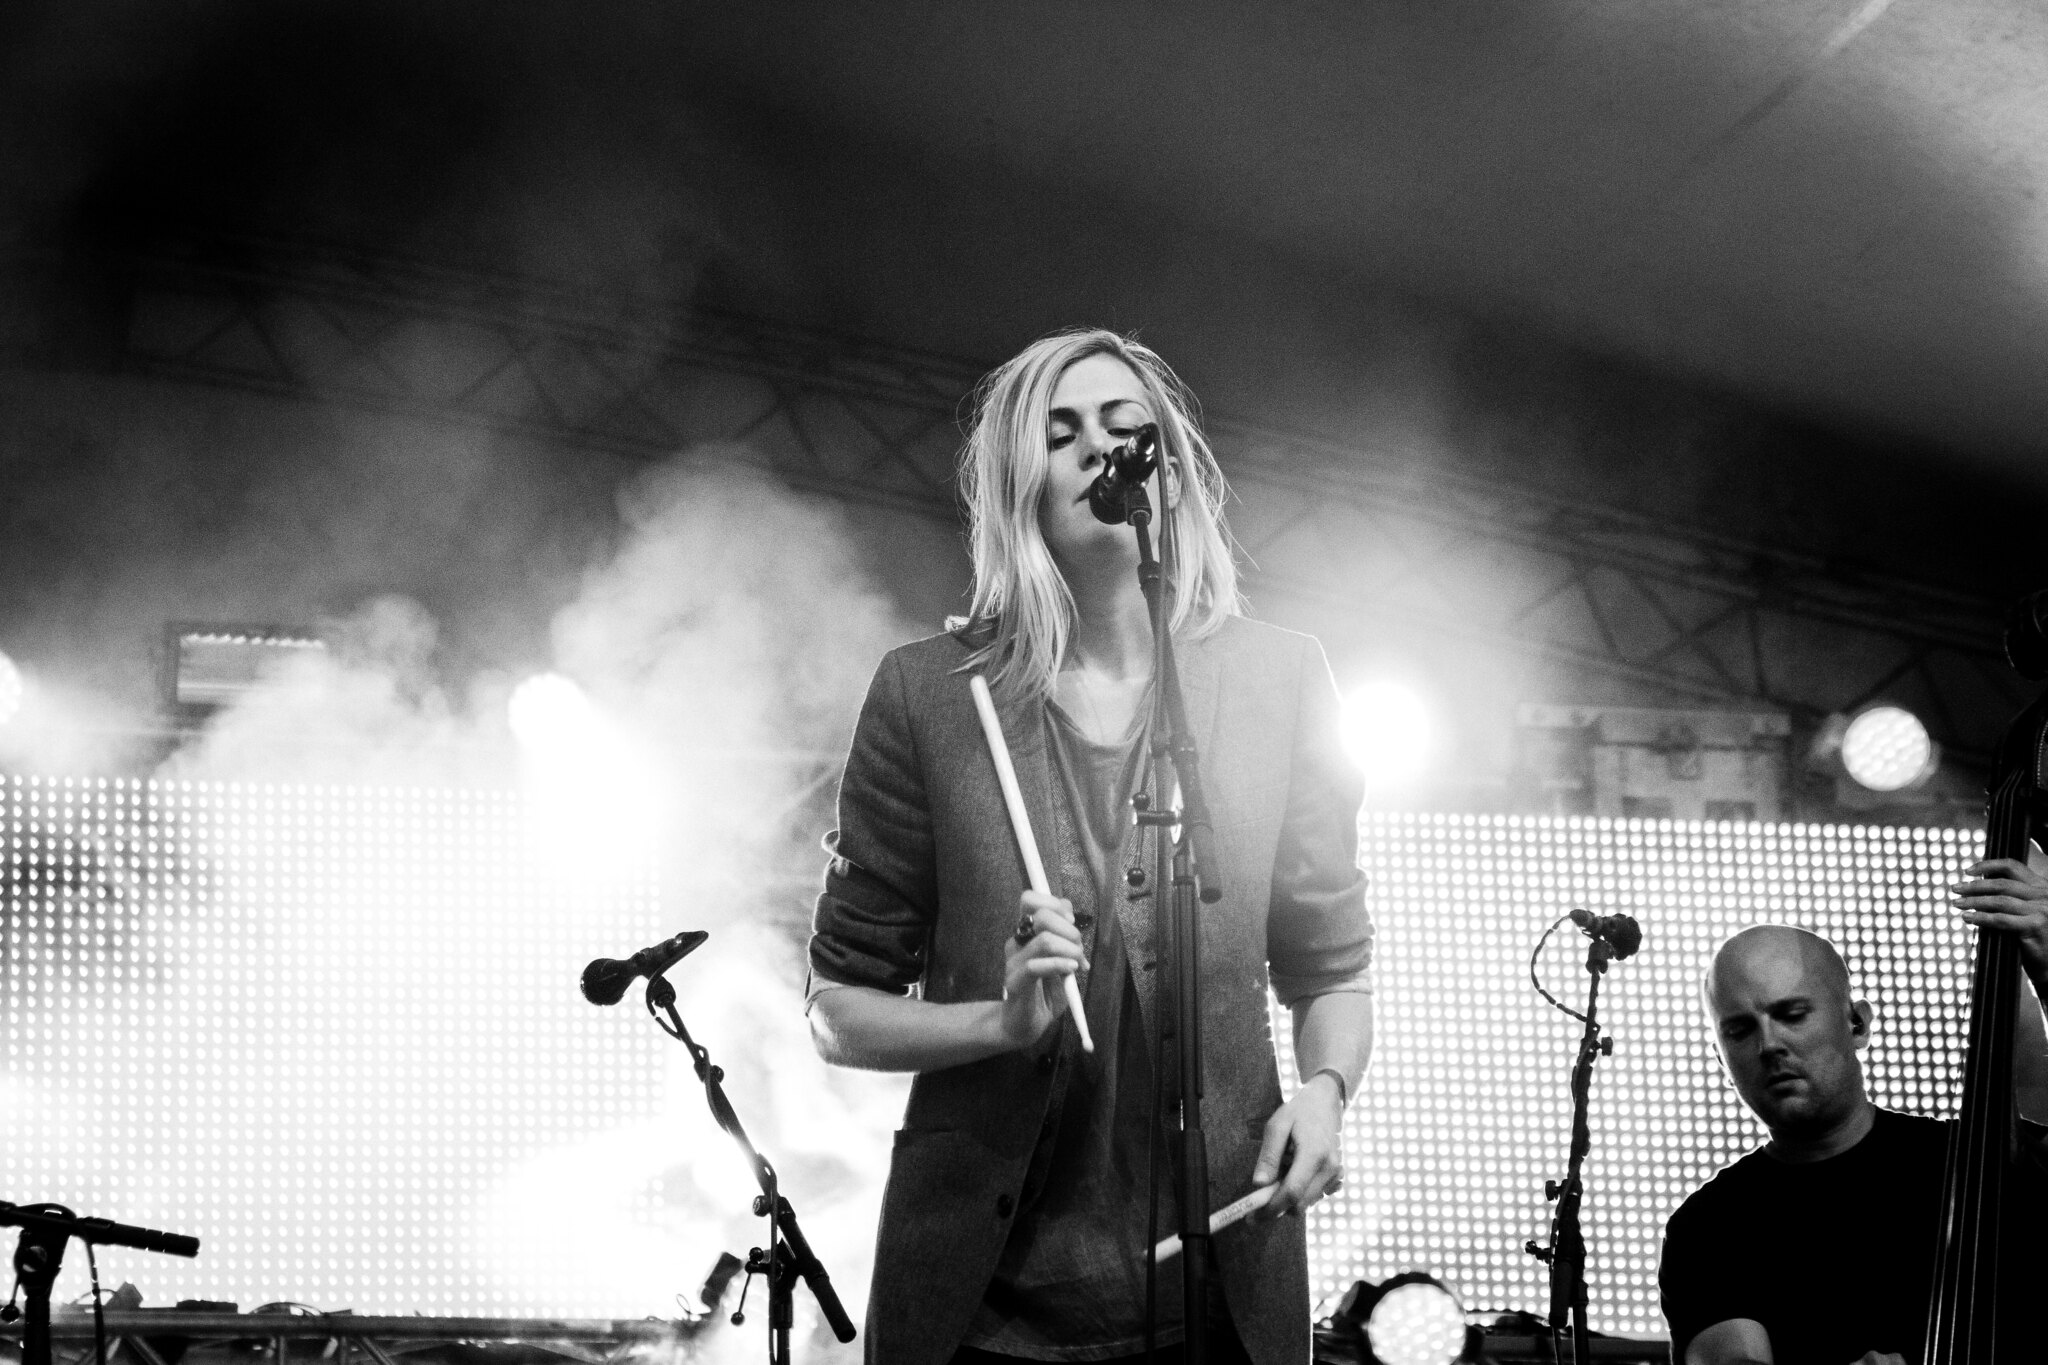 Anna Ternheim - Malmöfestivalen 2012